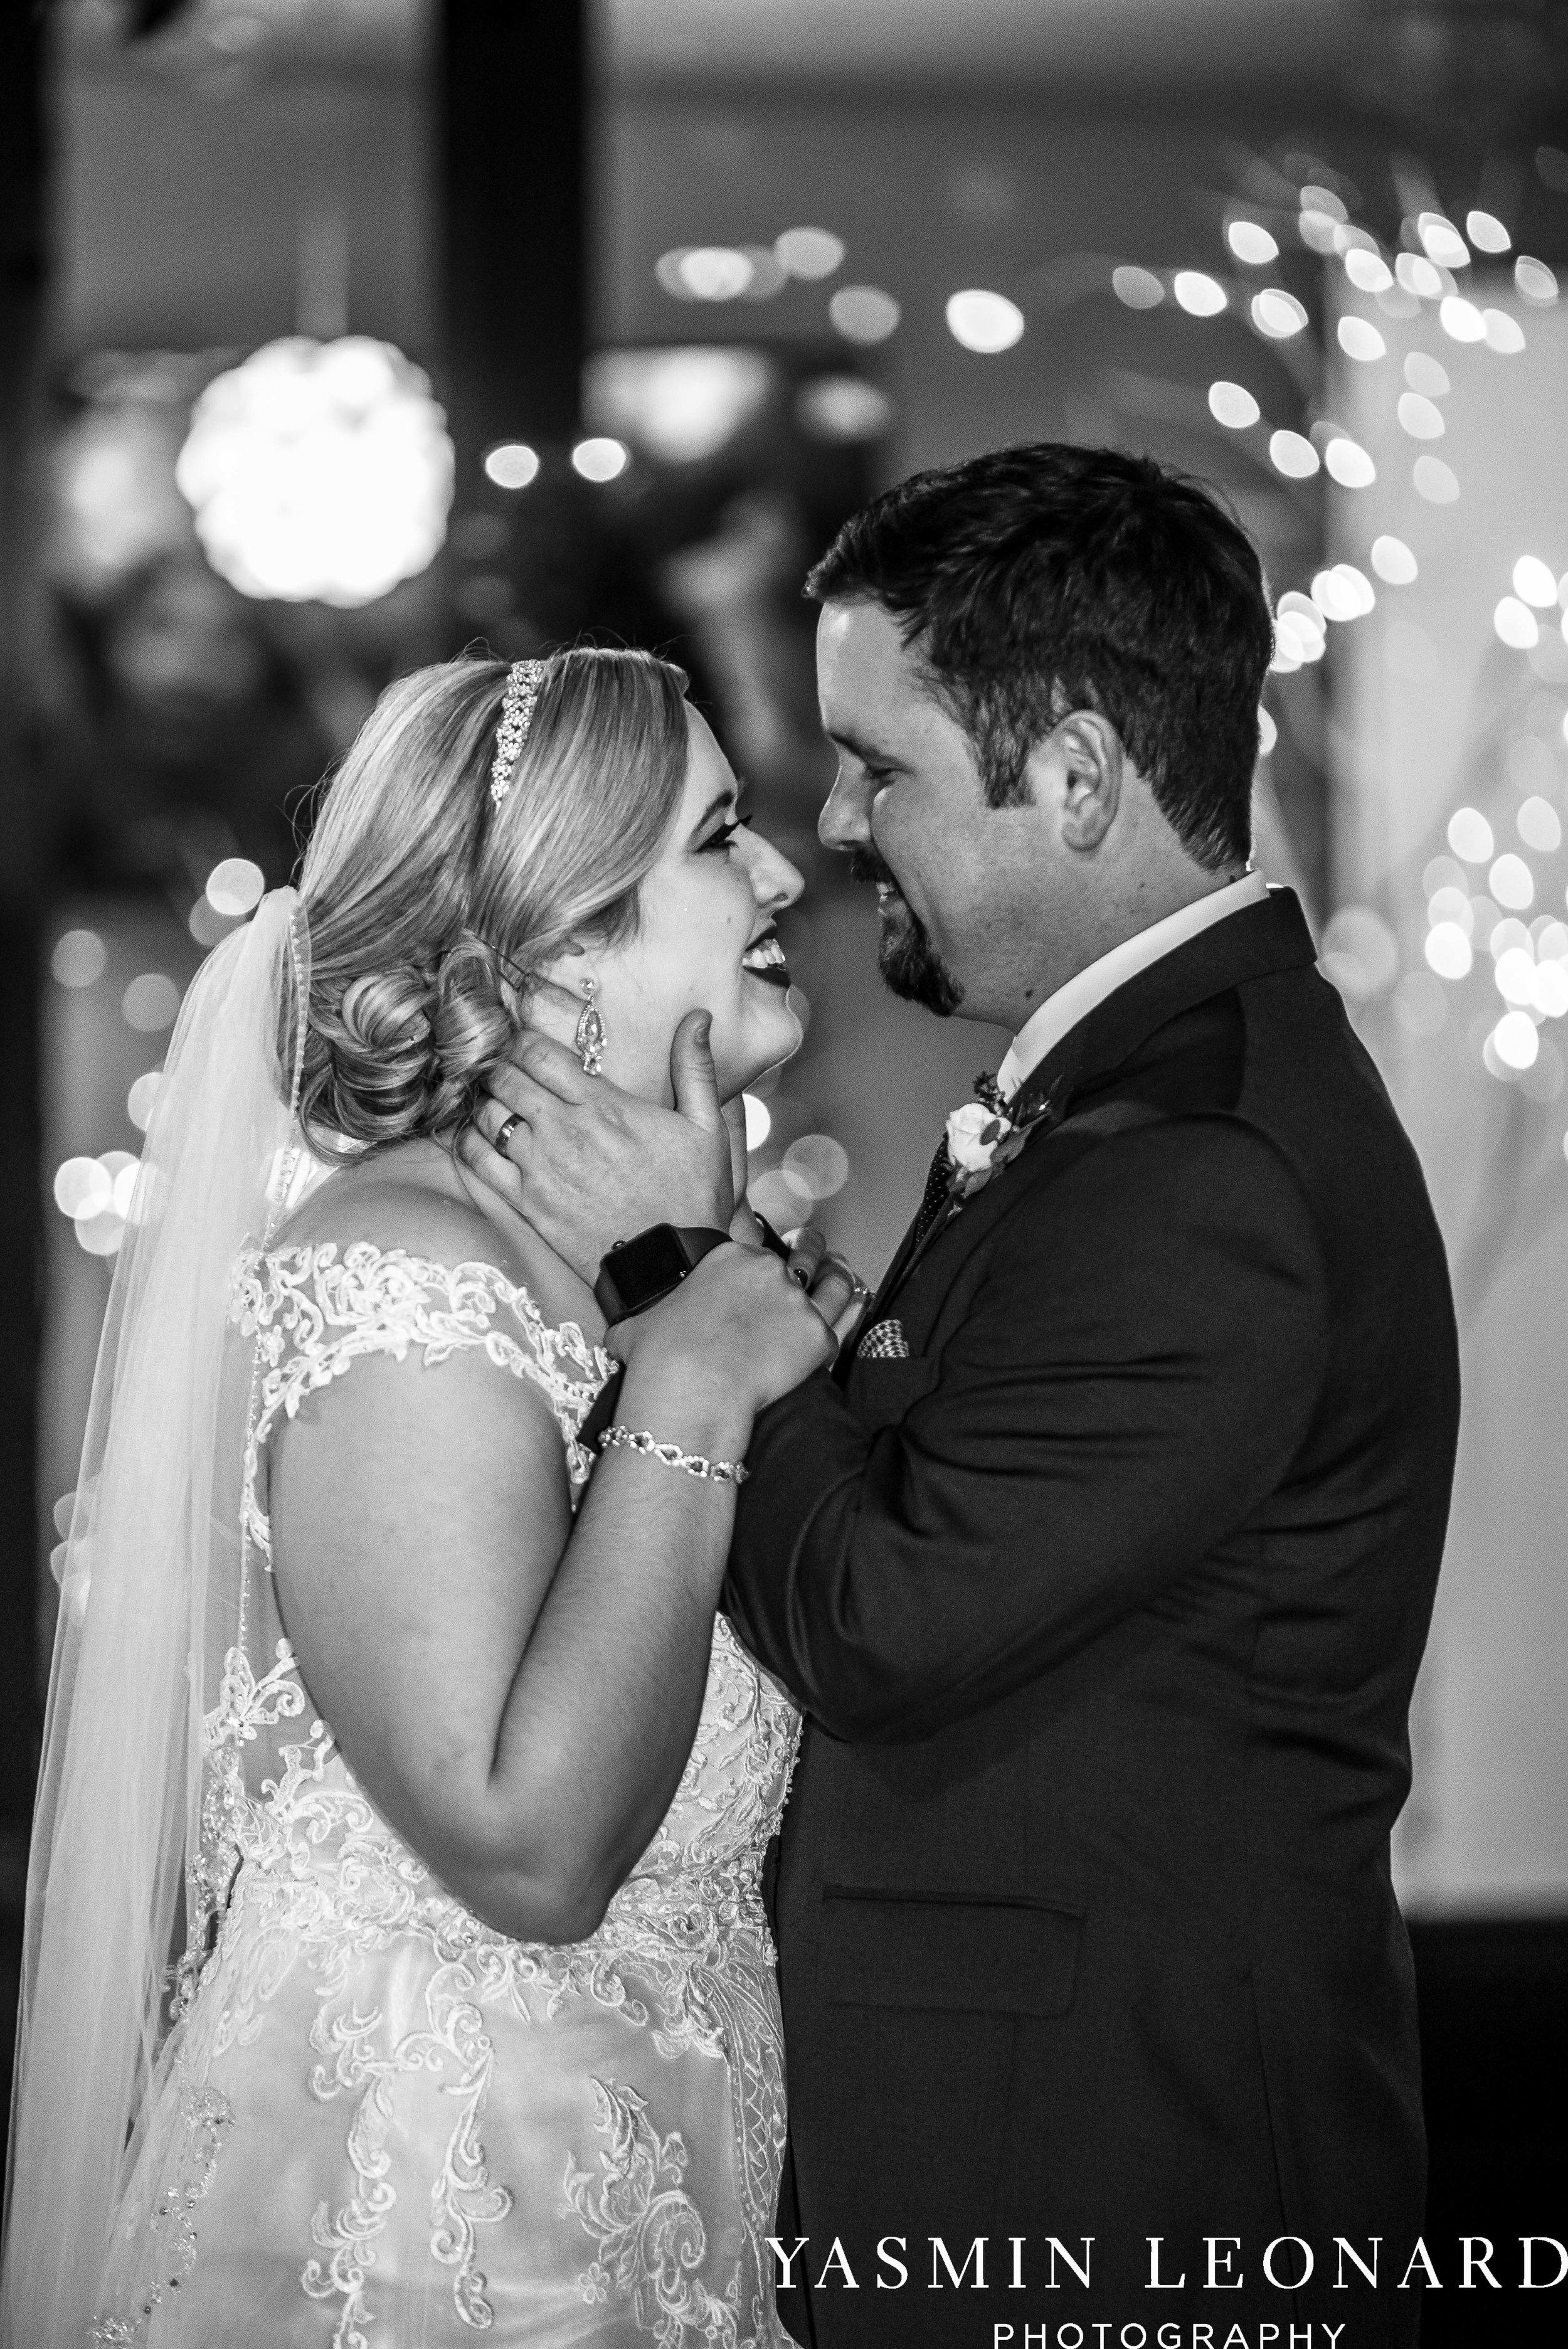 Rebekah and Matt - 105 Worth Event Centre - Yasmin Leonard Photography - Asheboro Wedding - NC Wedding - High Point Weddings - Triad Weddings - Winter Wedding-40.jpg